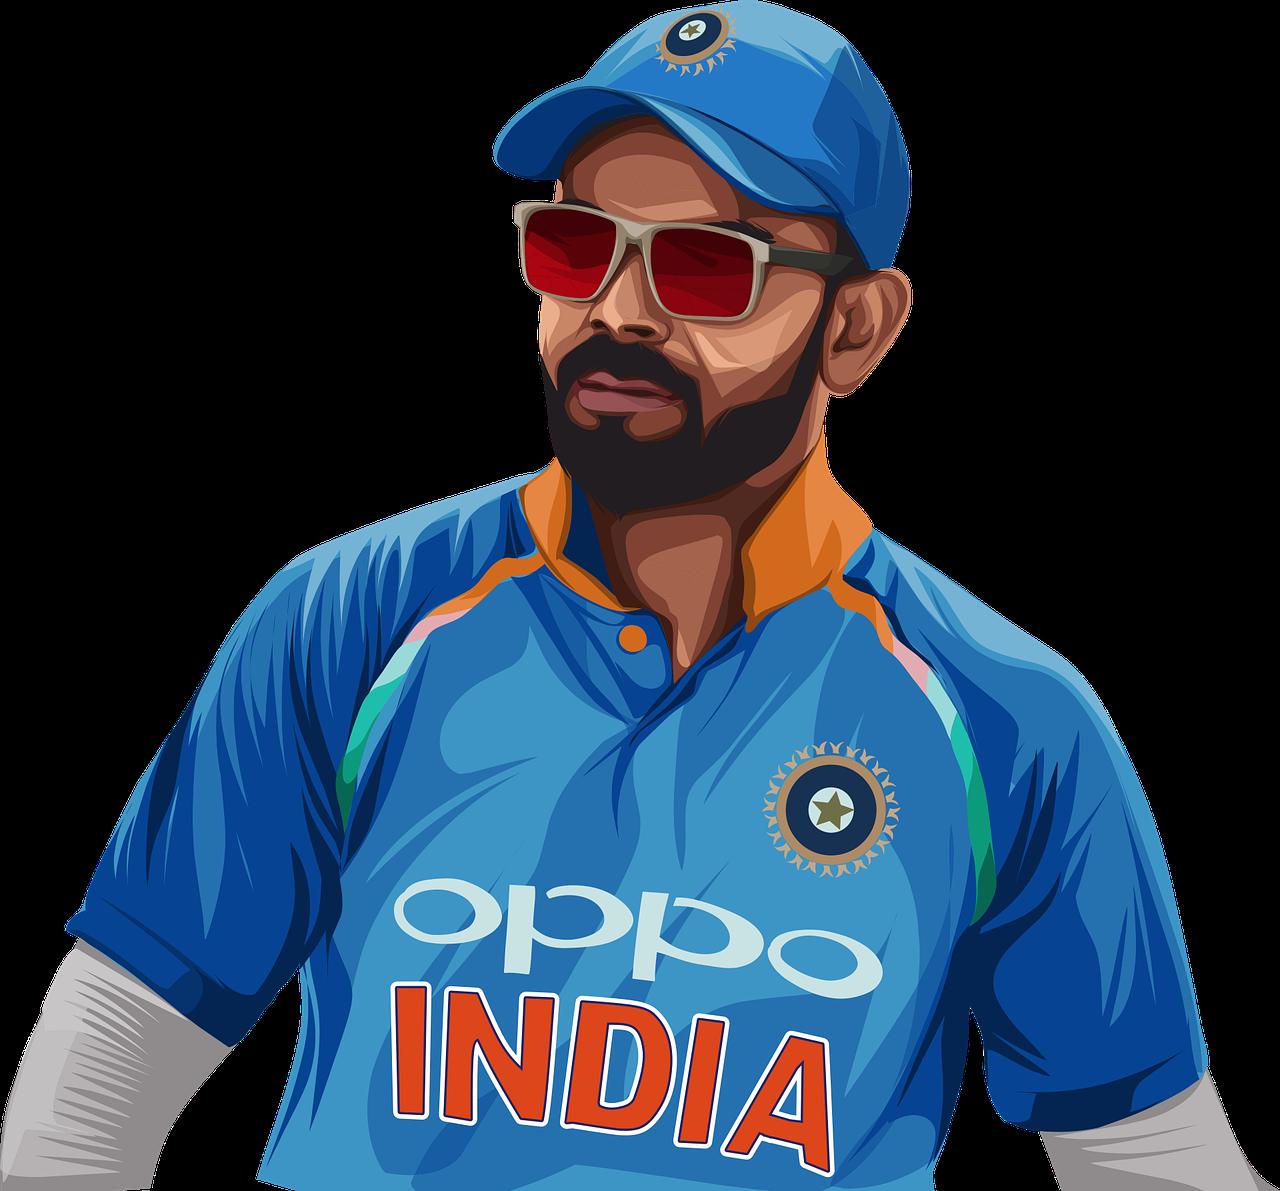 Virat Kohli Cricketer Player - Free vector graphic on Pixabay